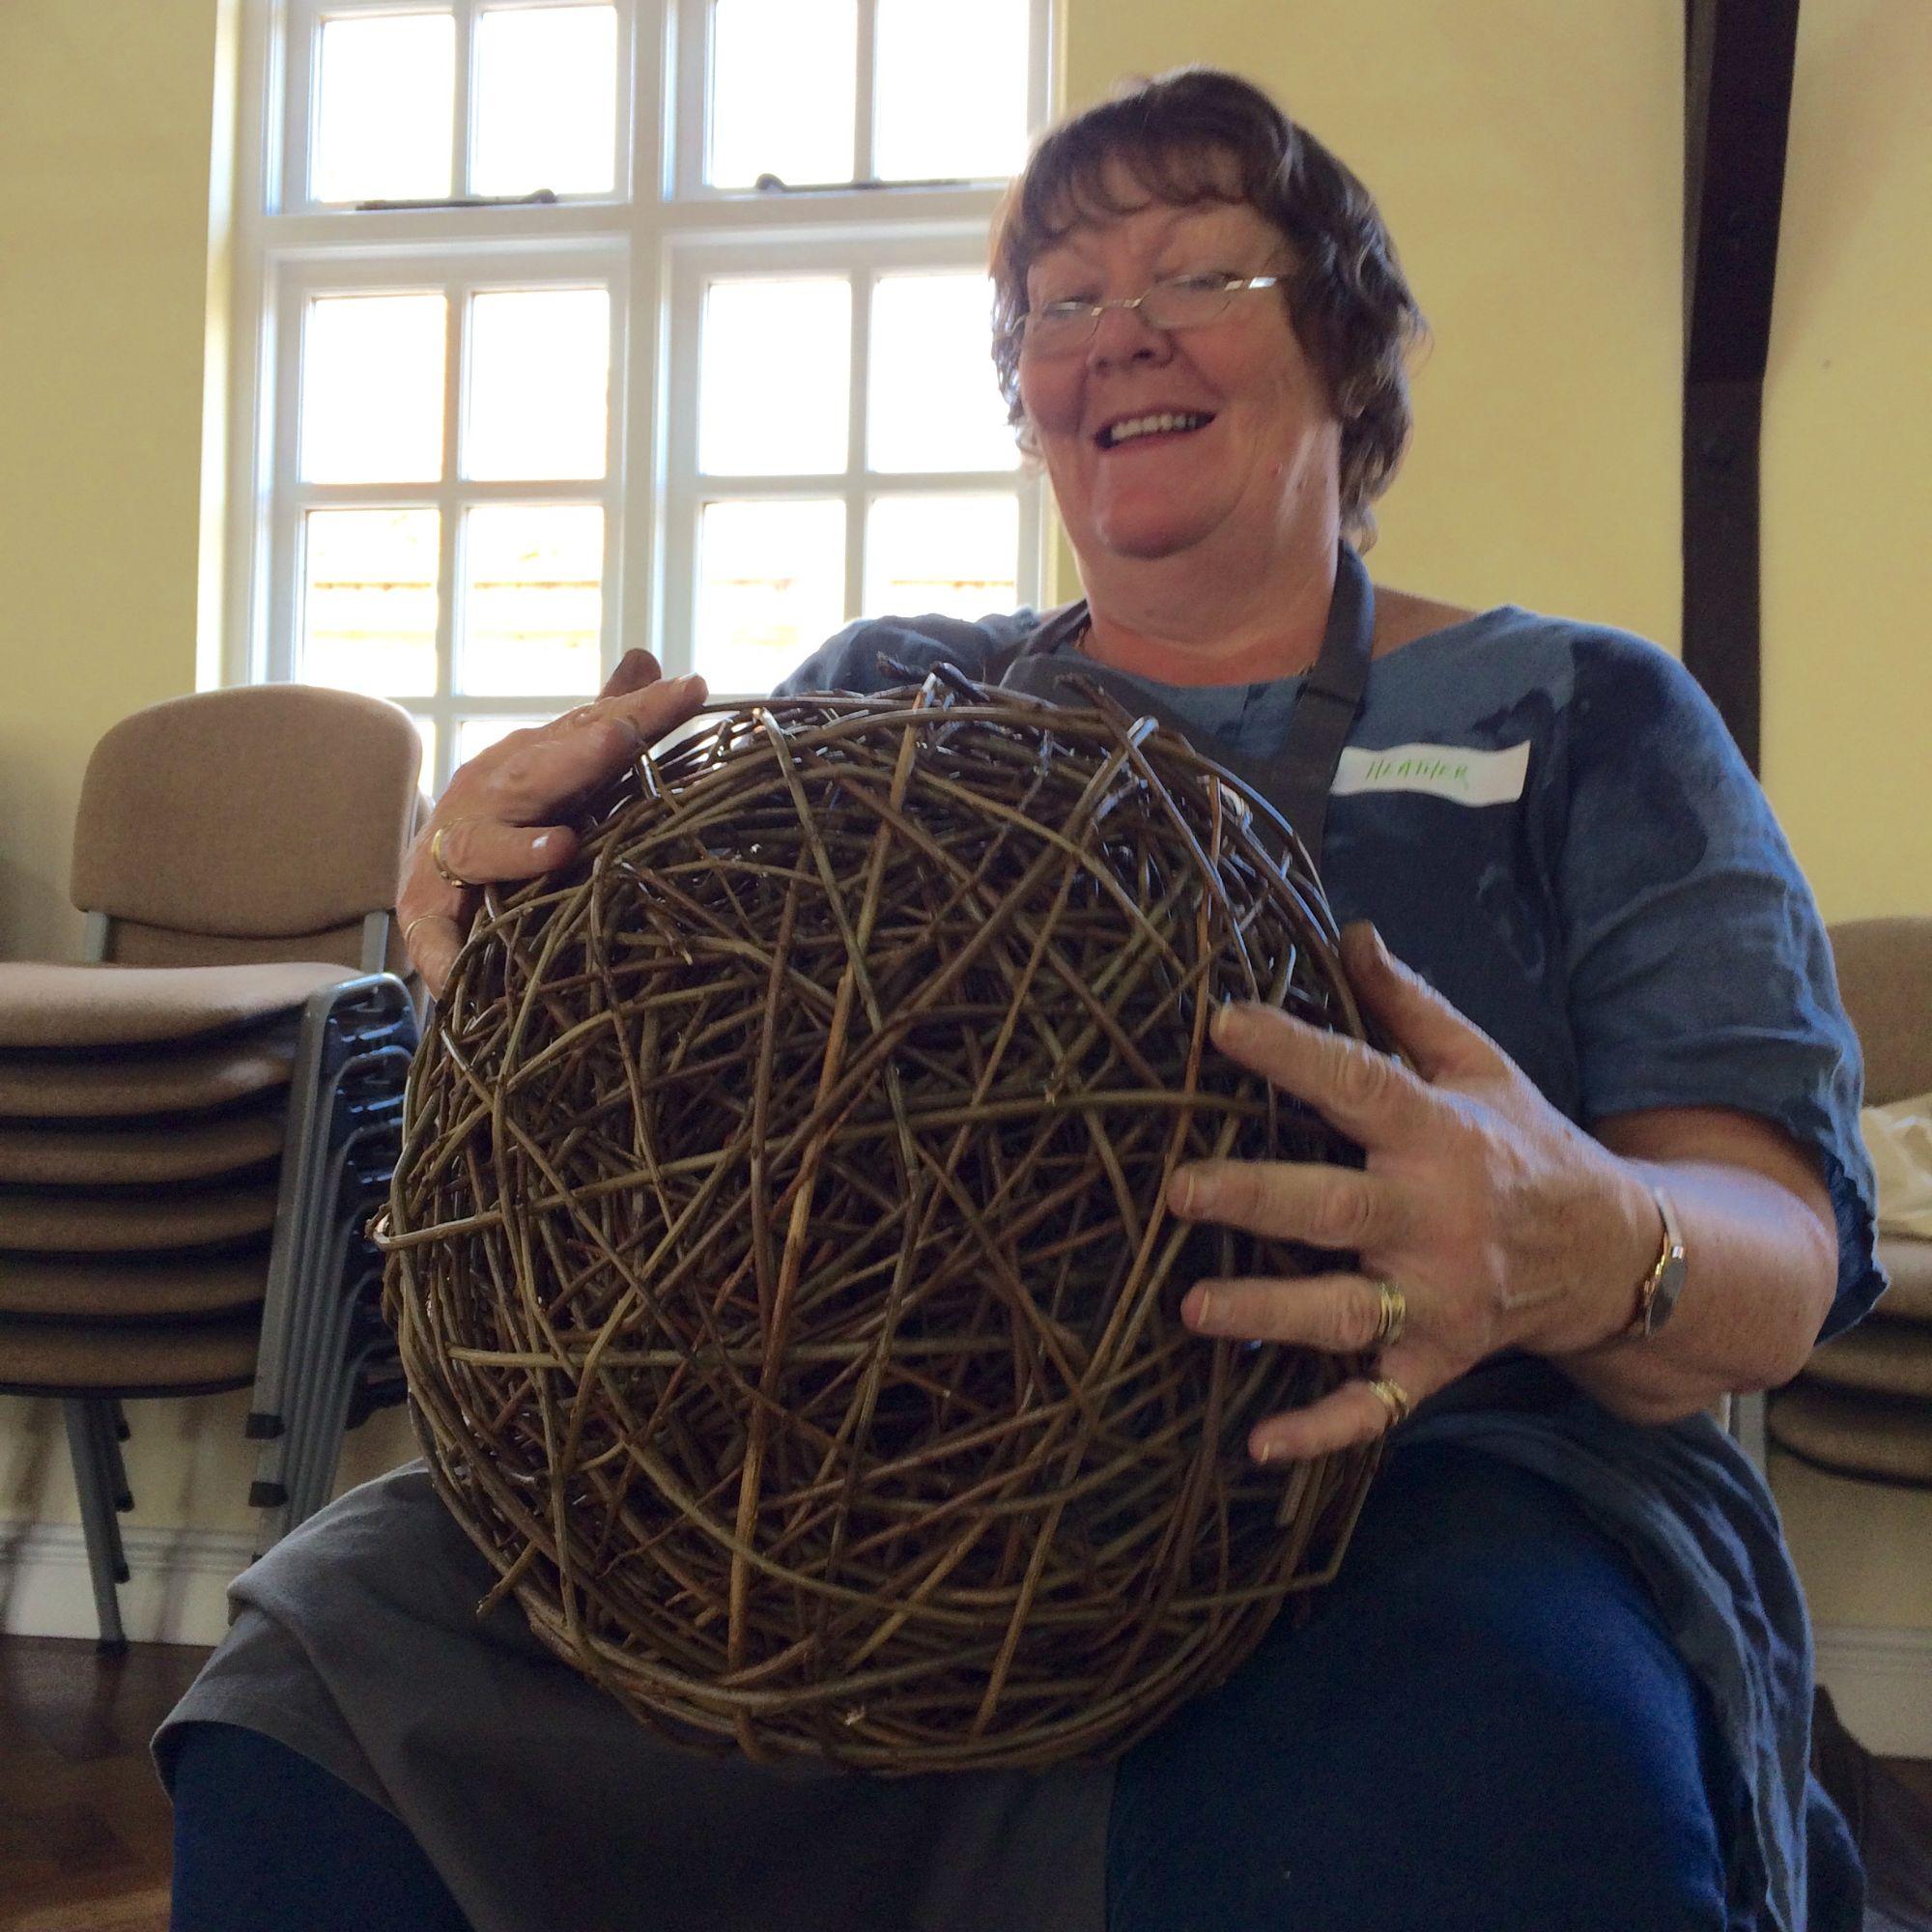 Willow Sphere Sculpture Workshop - Spheres